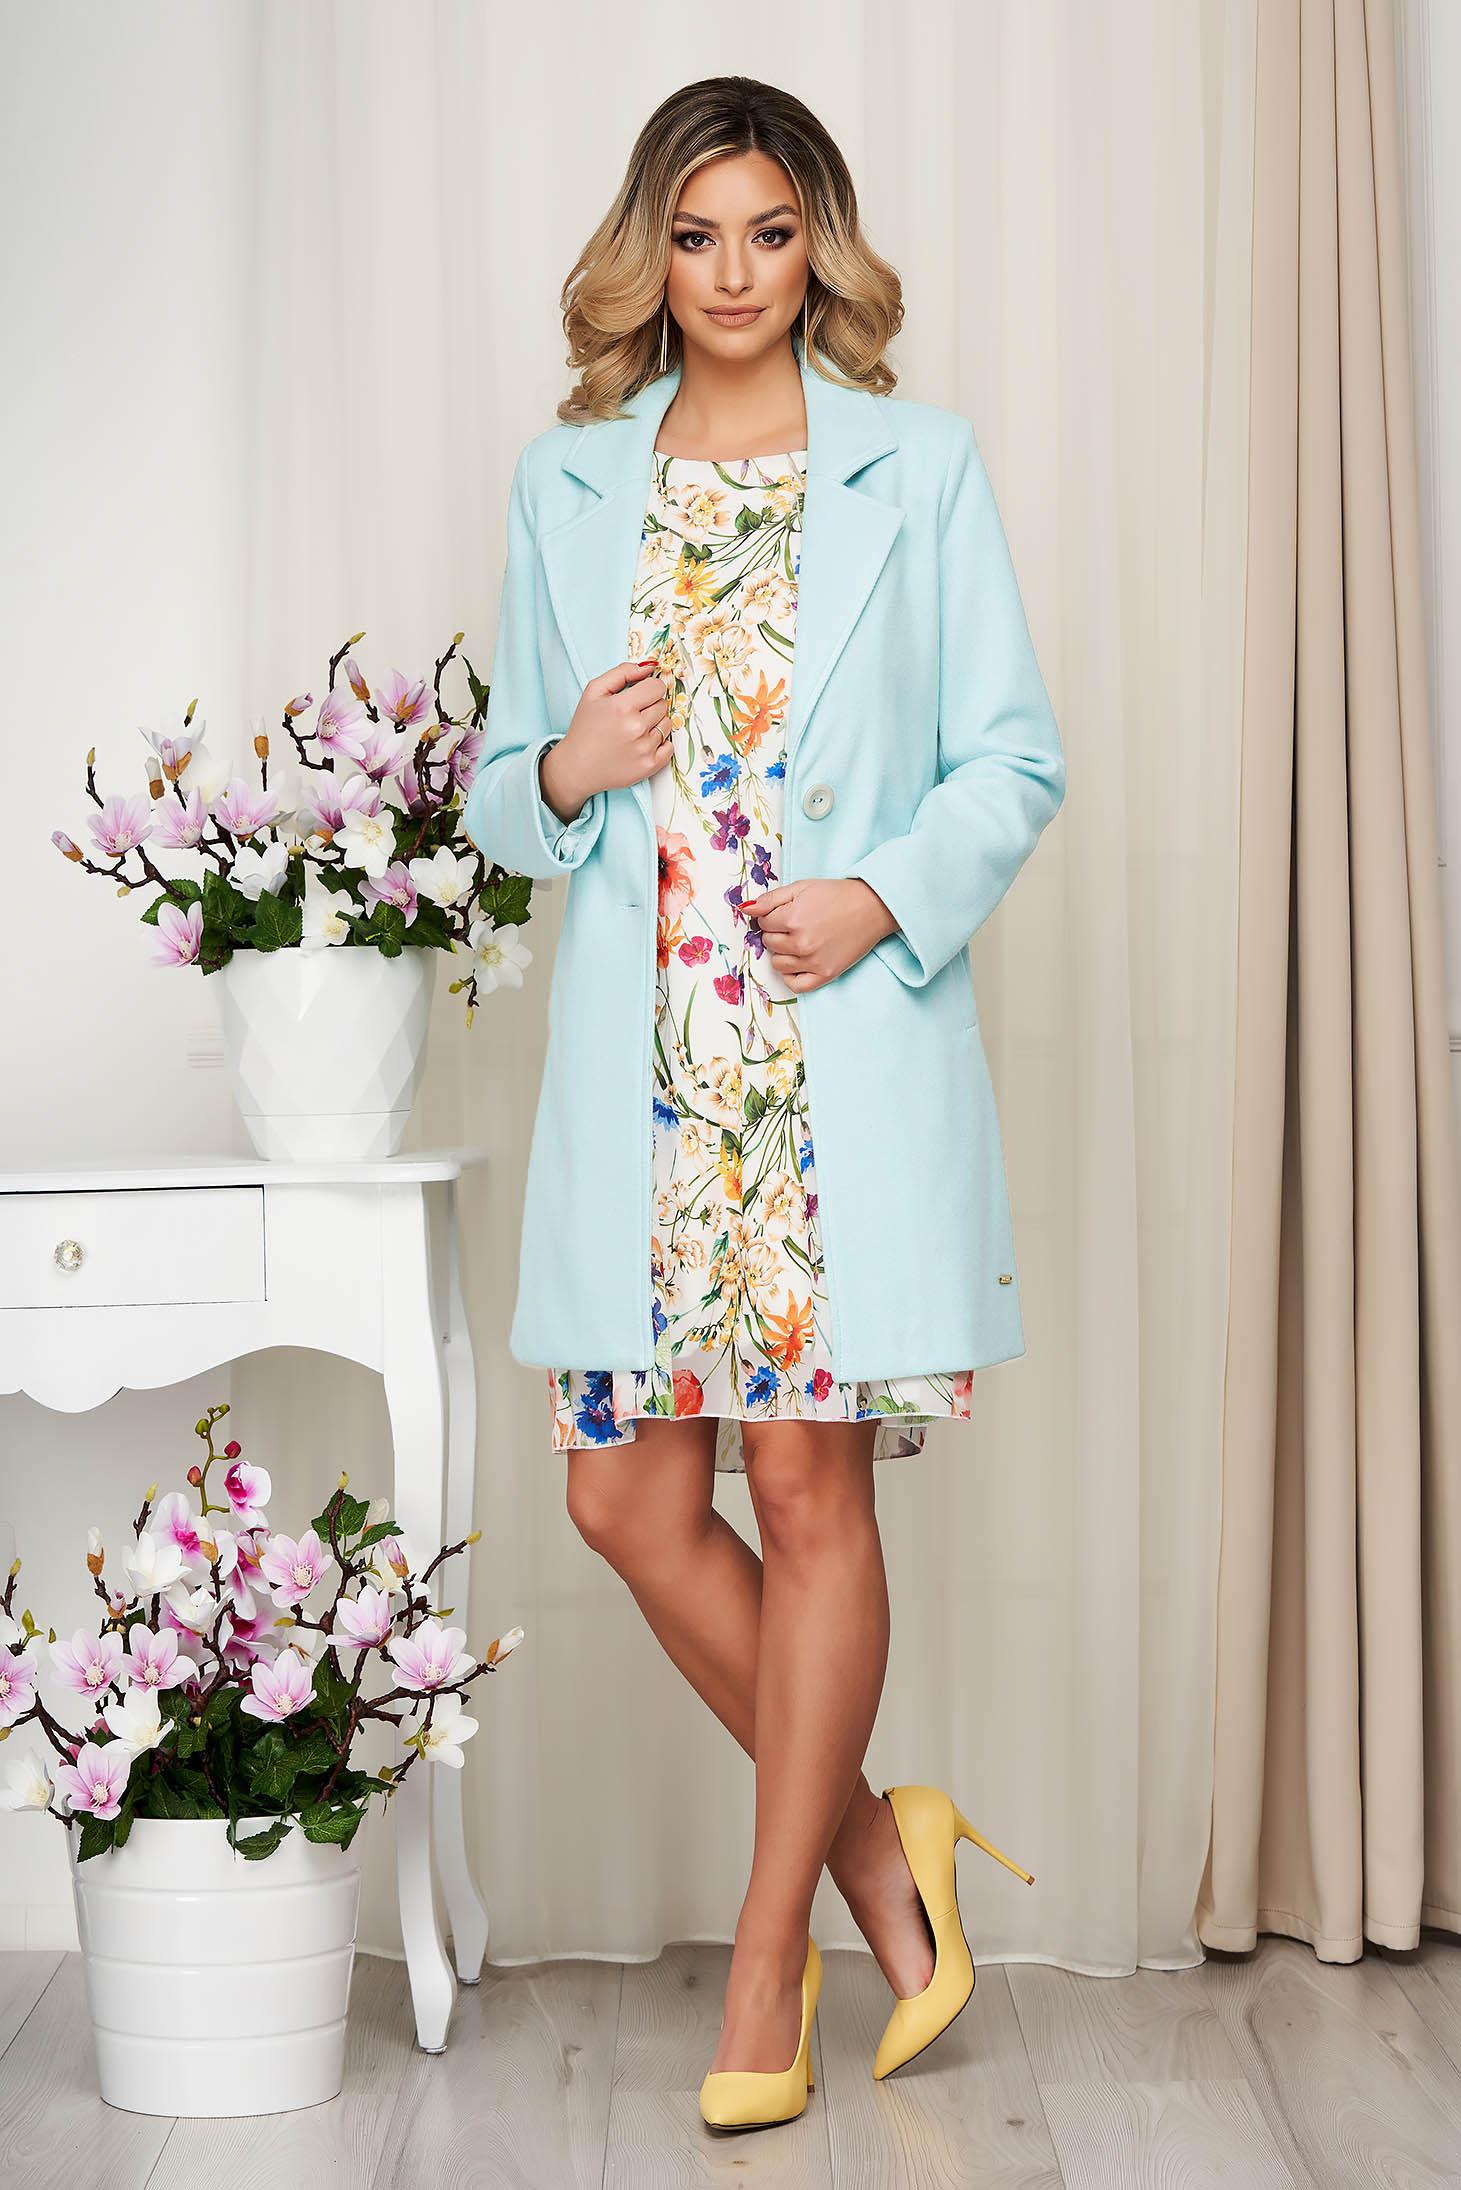 Overcoat lightblue soft fabric straight short cut